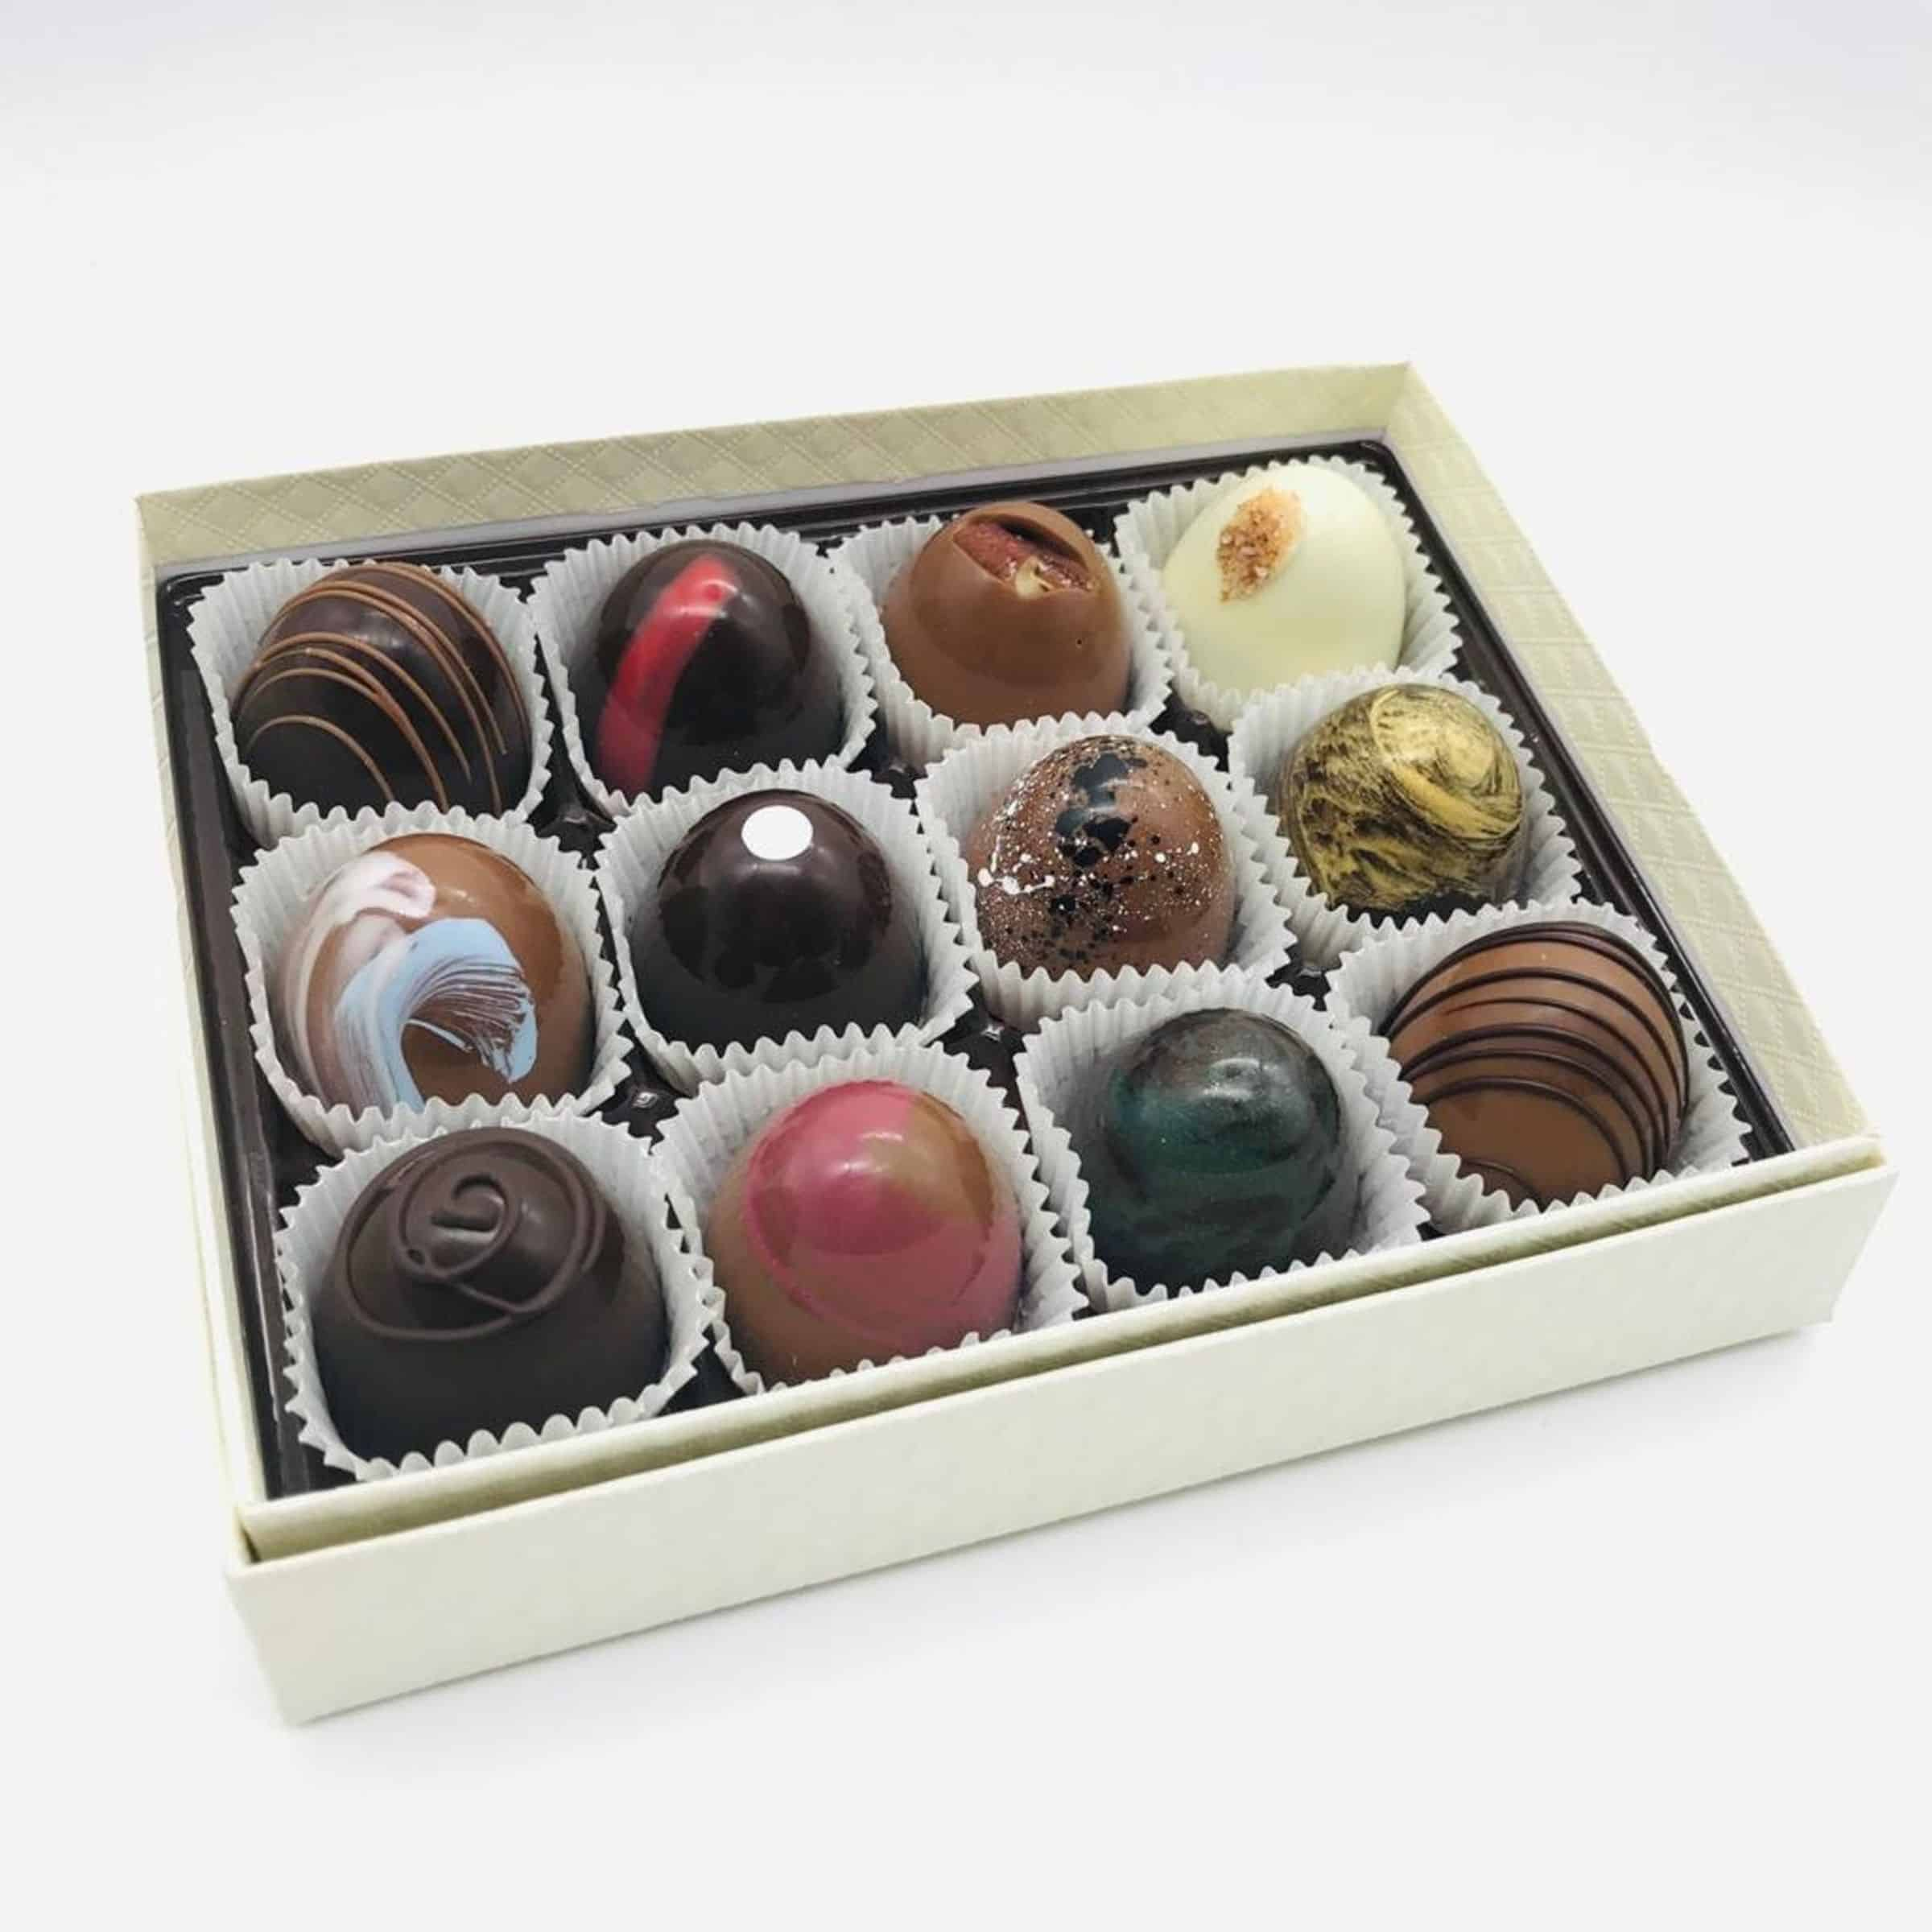 A box of artisan chocolates.